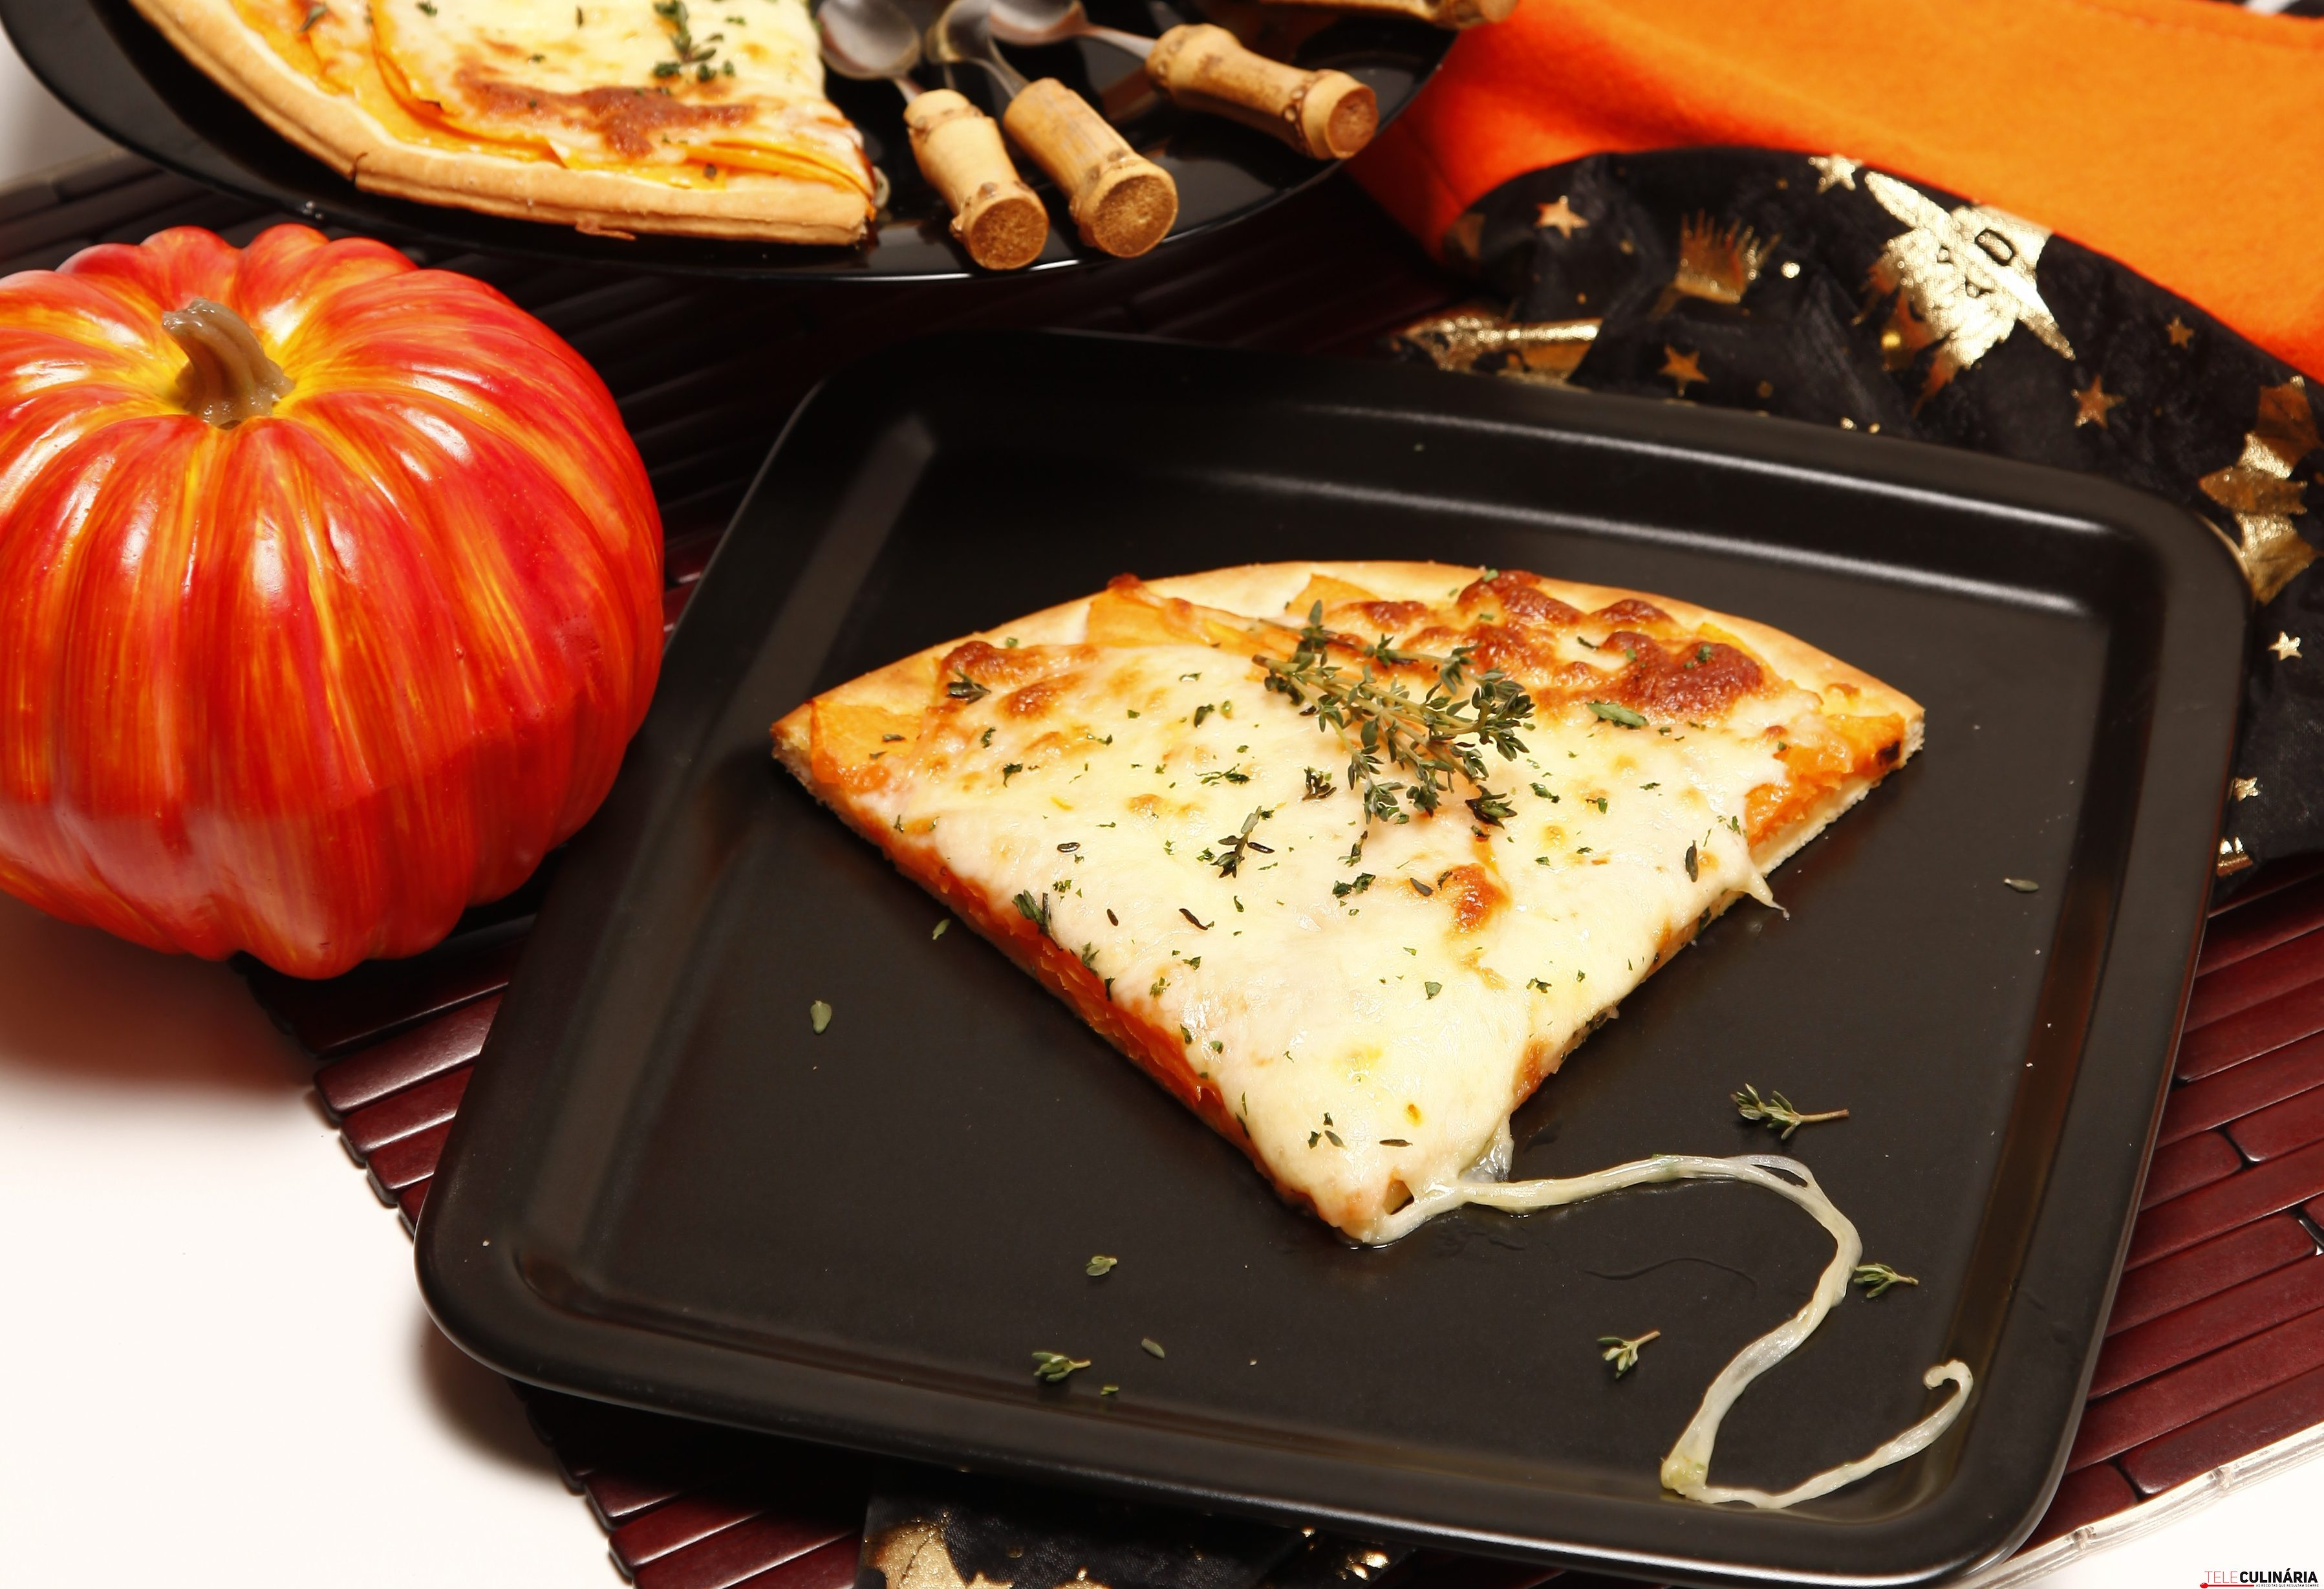 Pizza de abobora